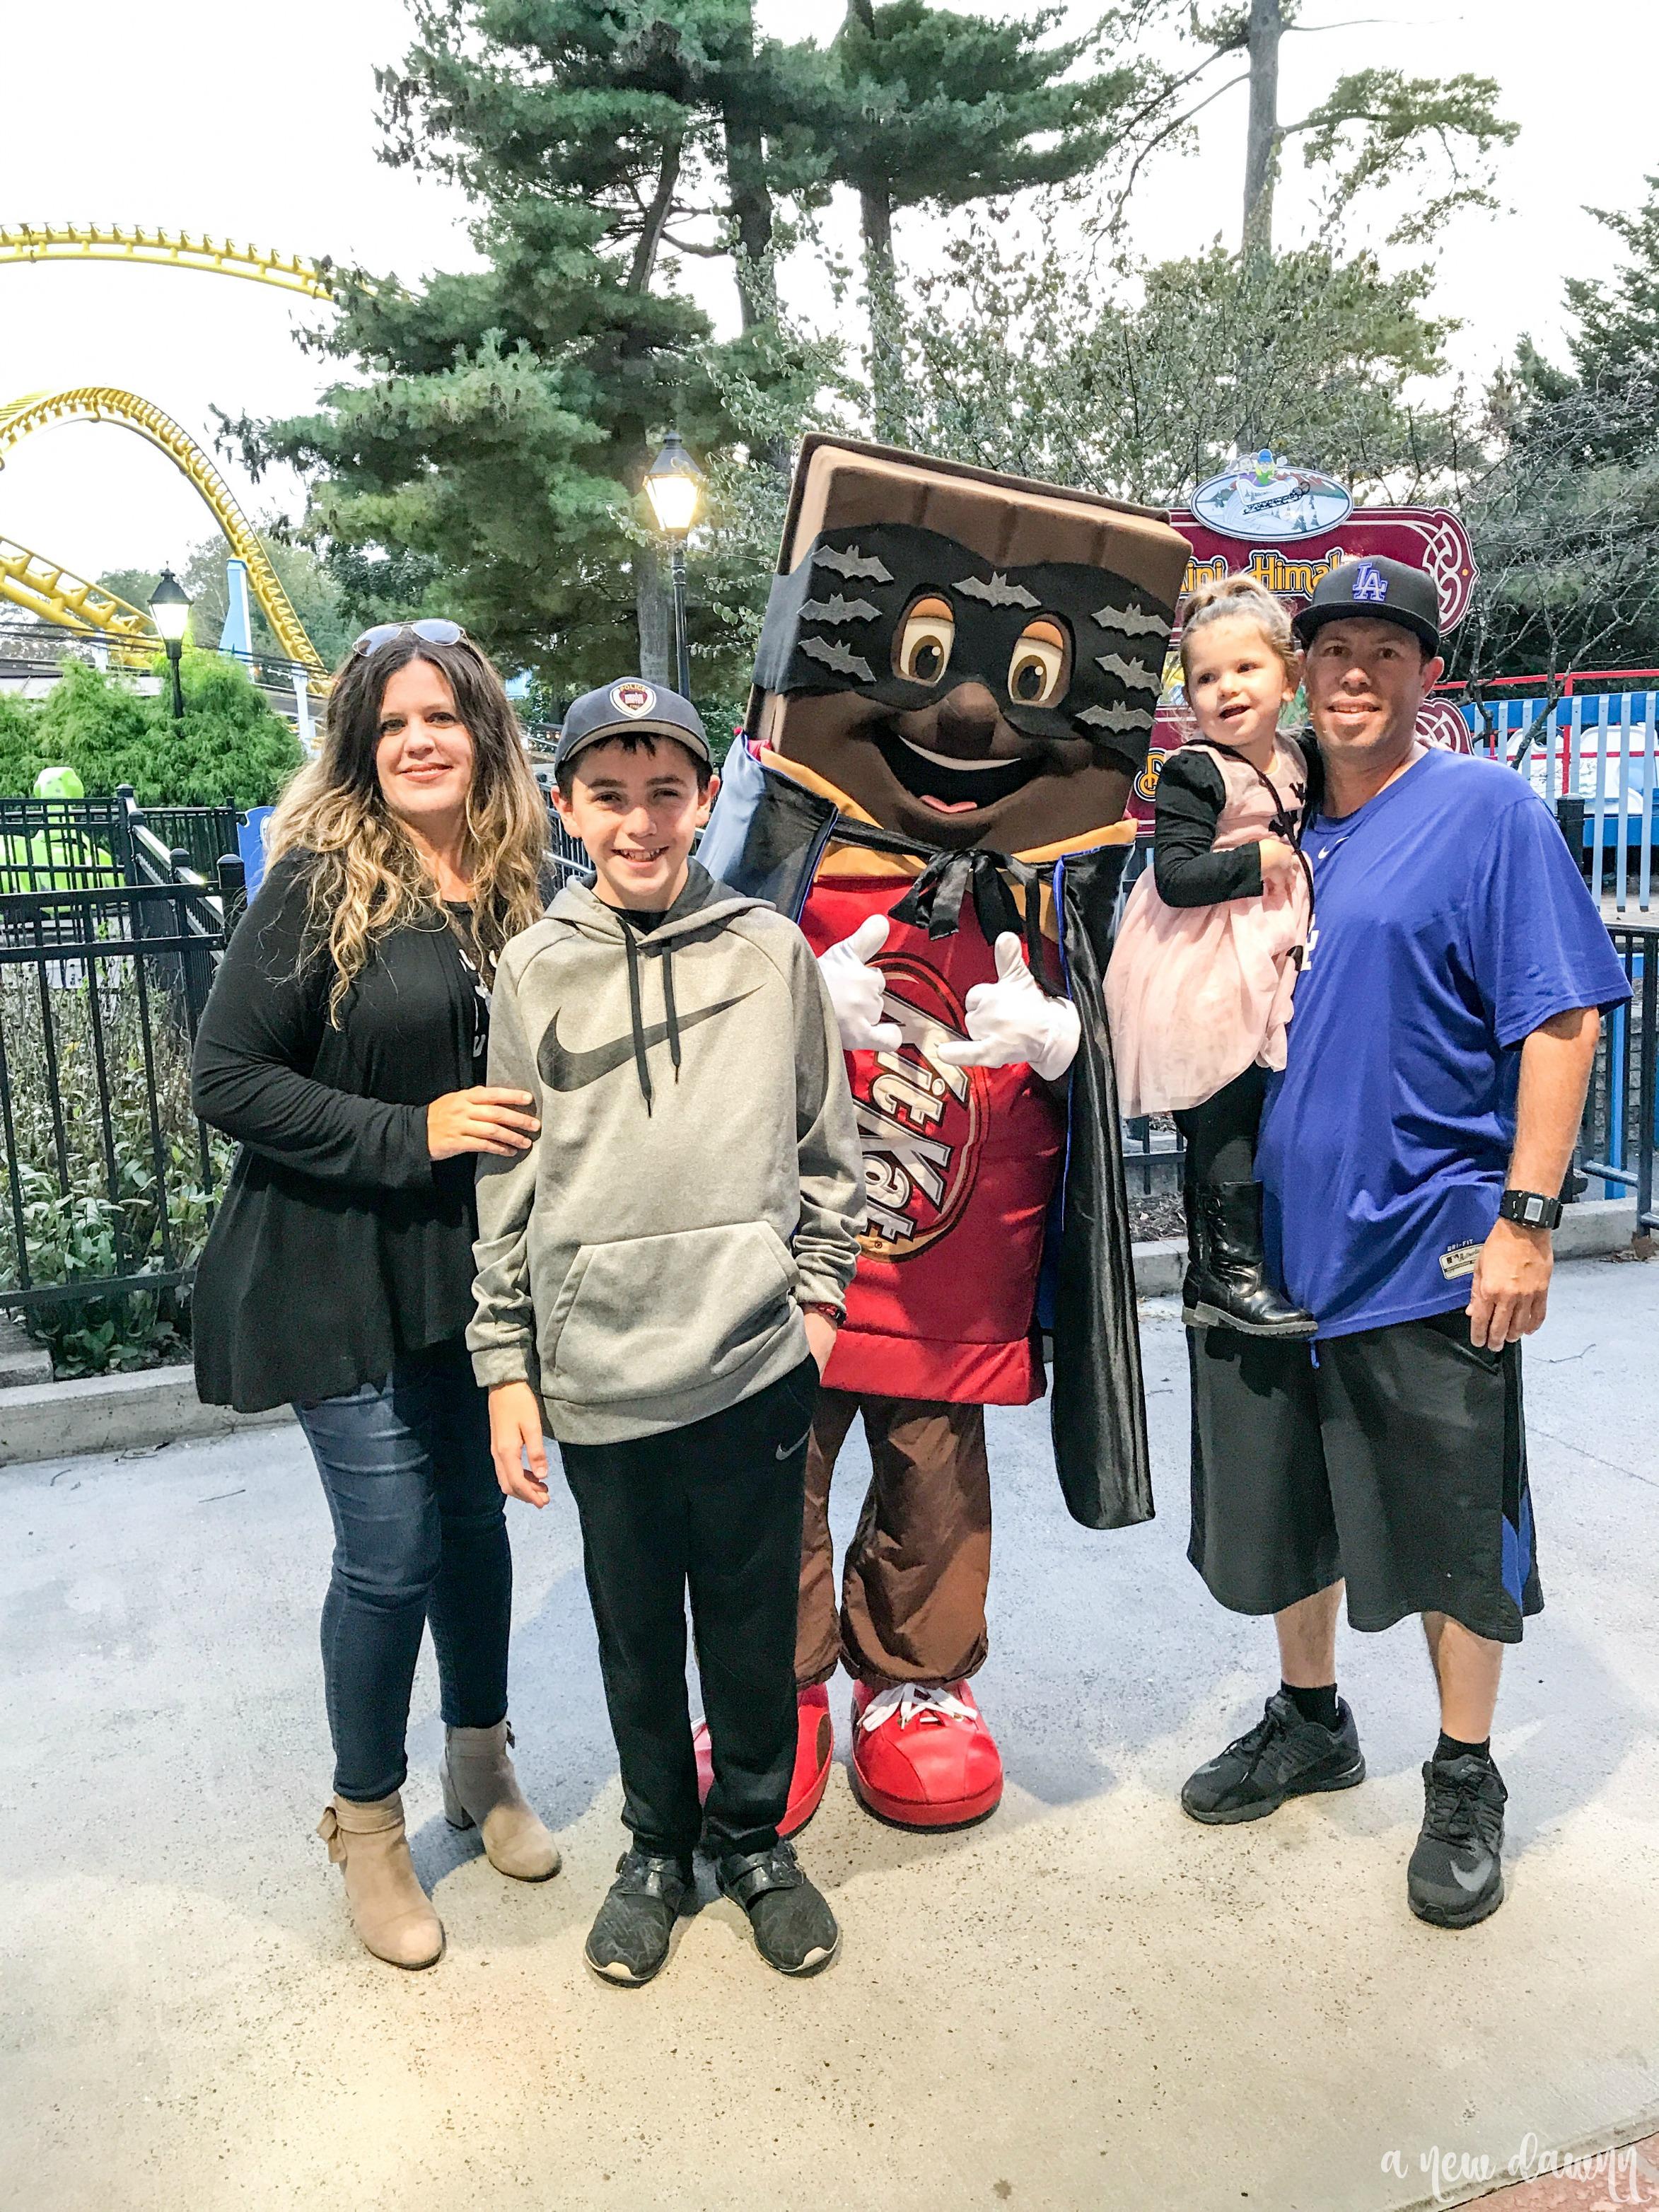 Family visiting Hersheypark